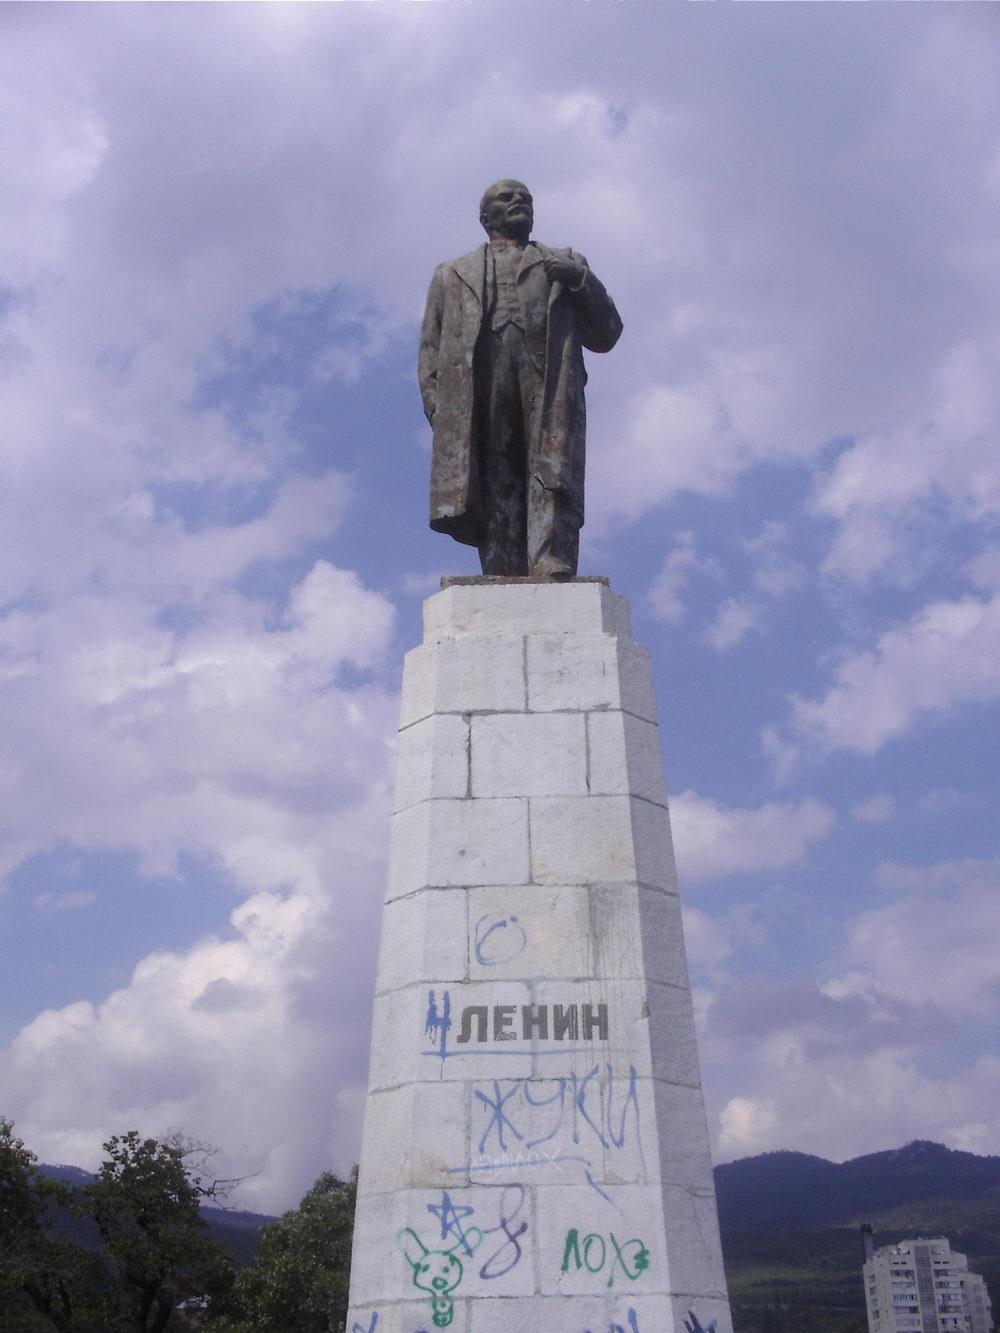 Lenjin još uvek krasi trgove mnogih mesta na Krimu, pa i tatarski gradić Koreiz